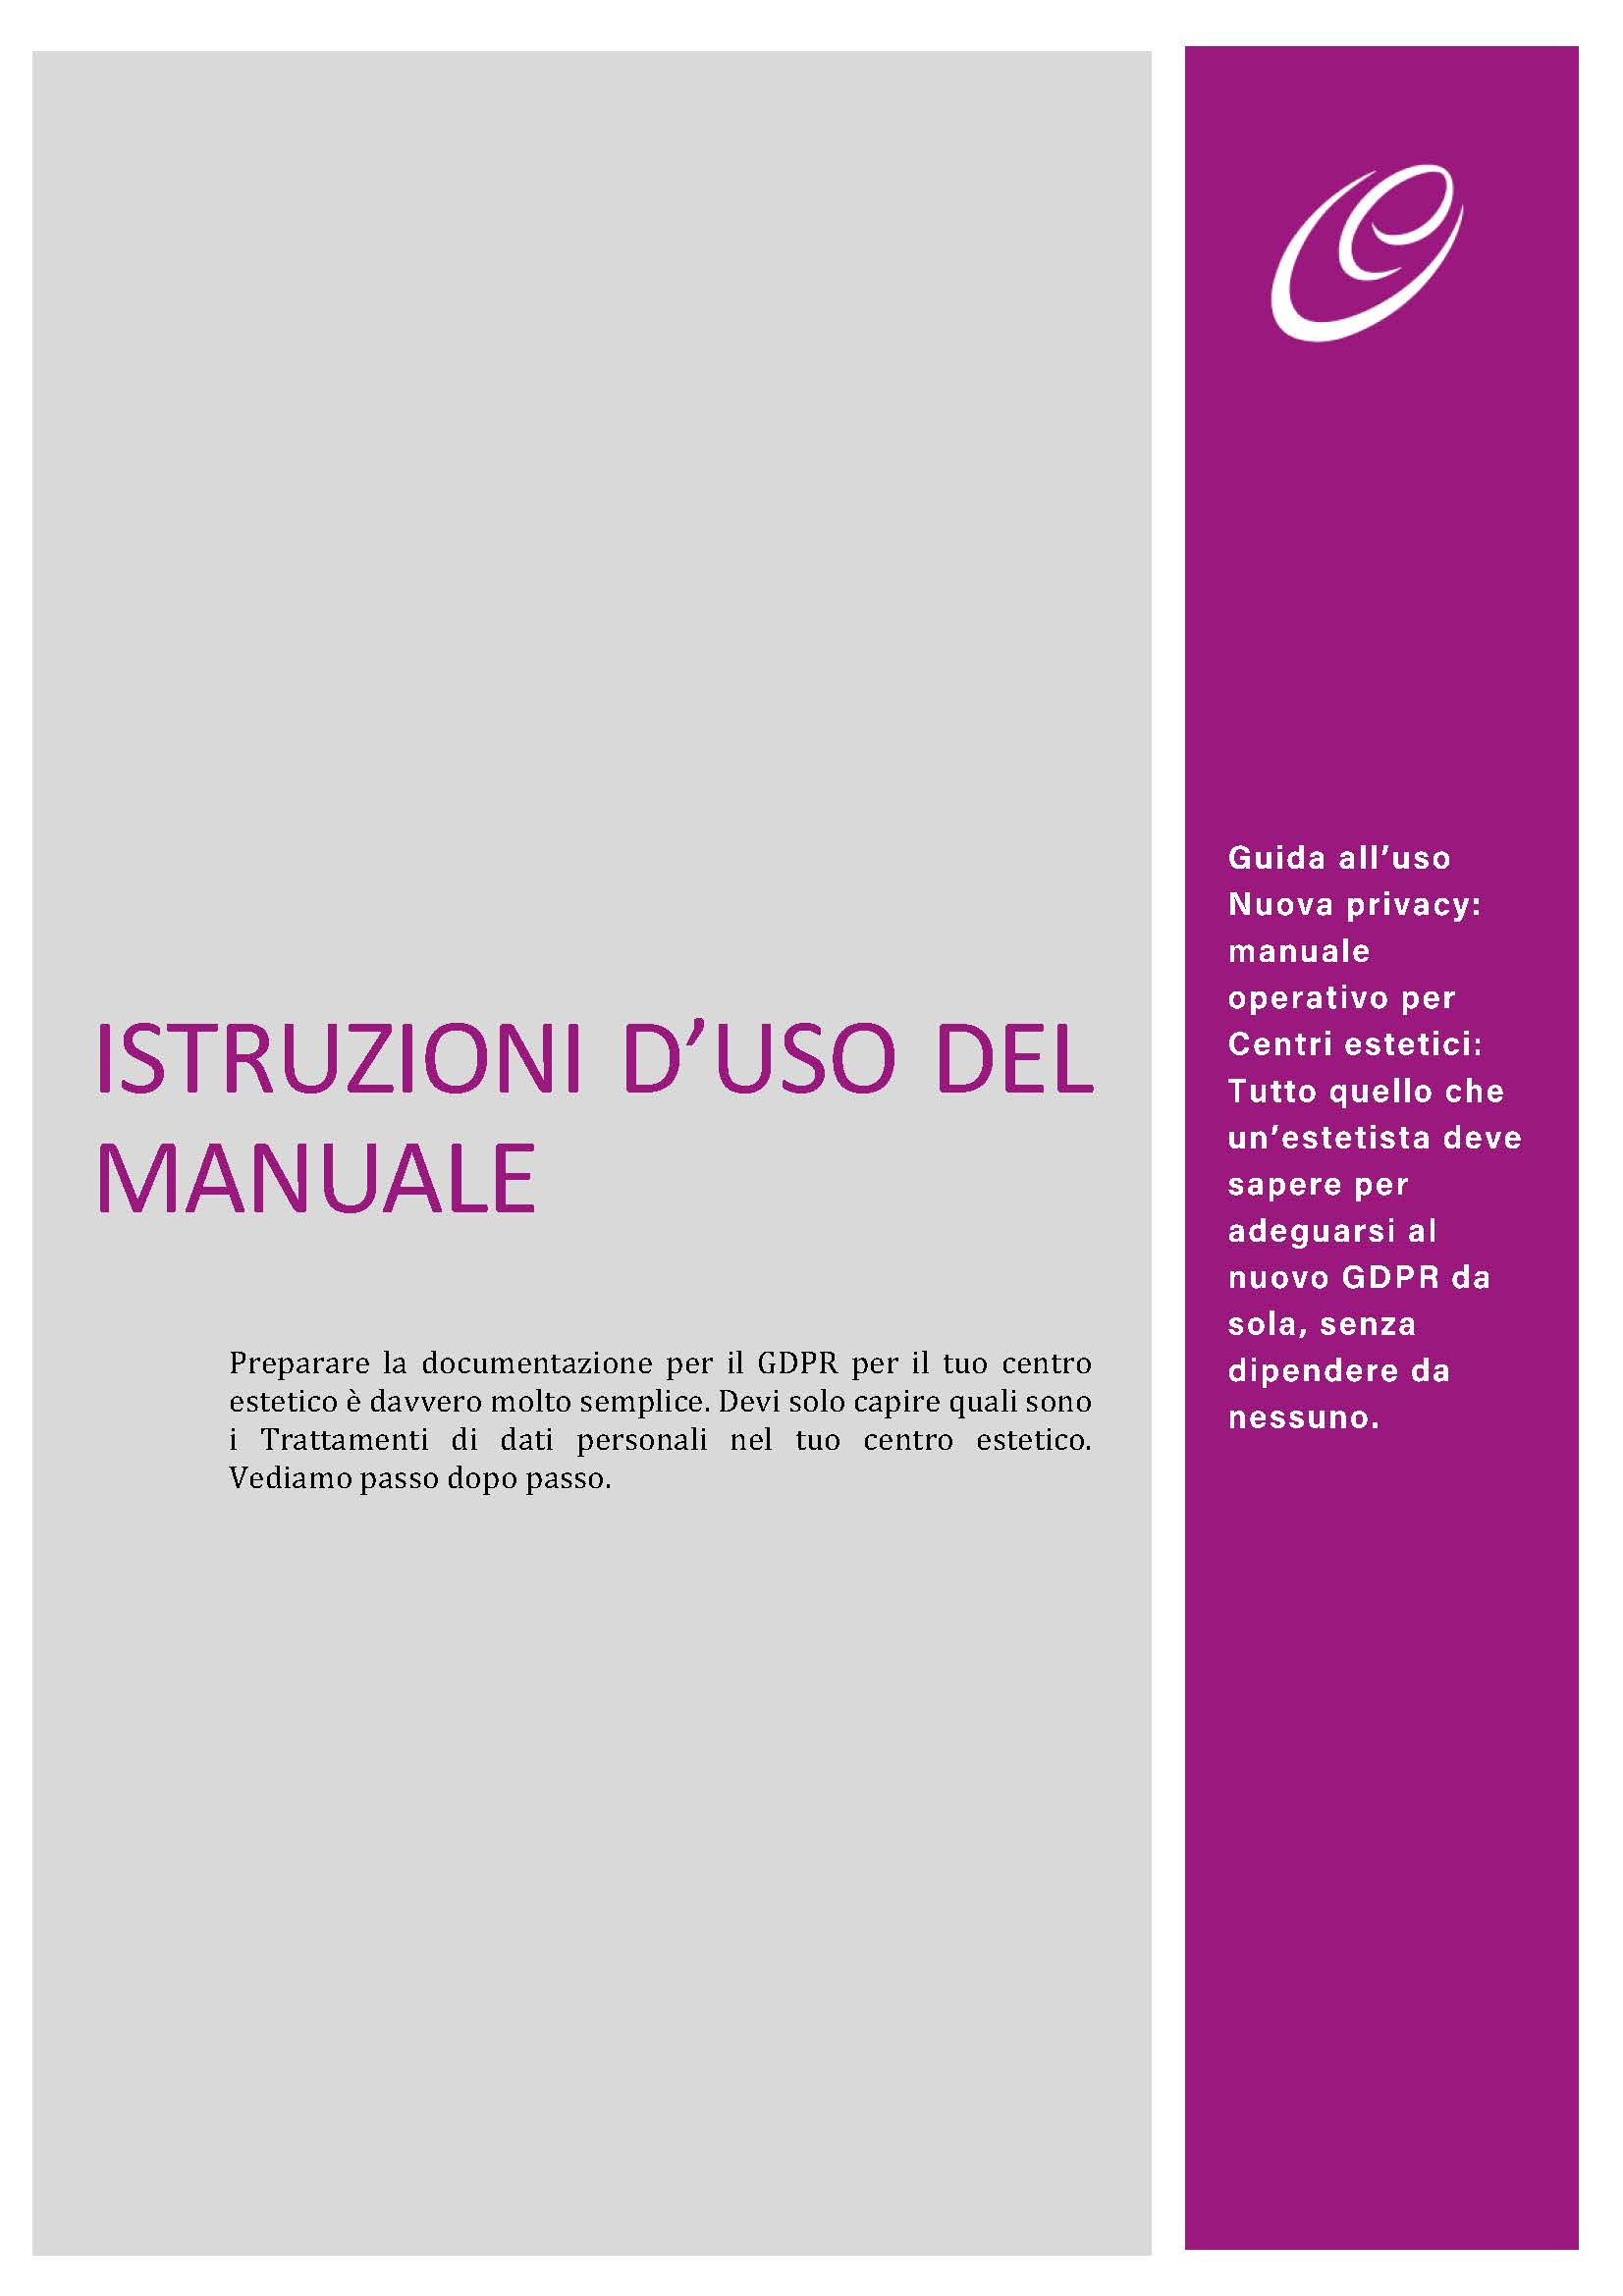 Manuale - istruzioni USO_Pagina_01